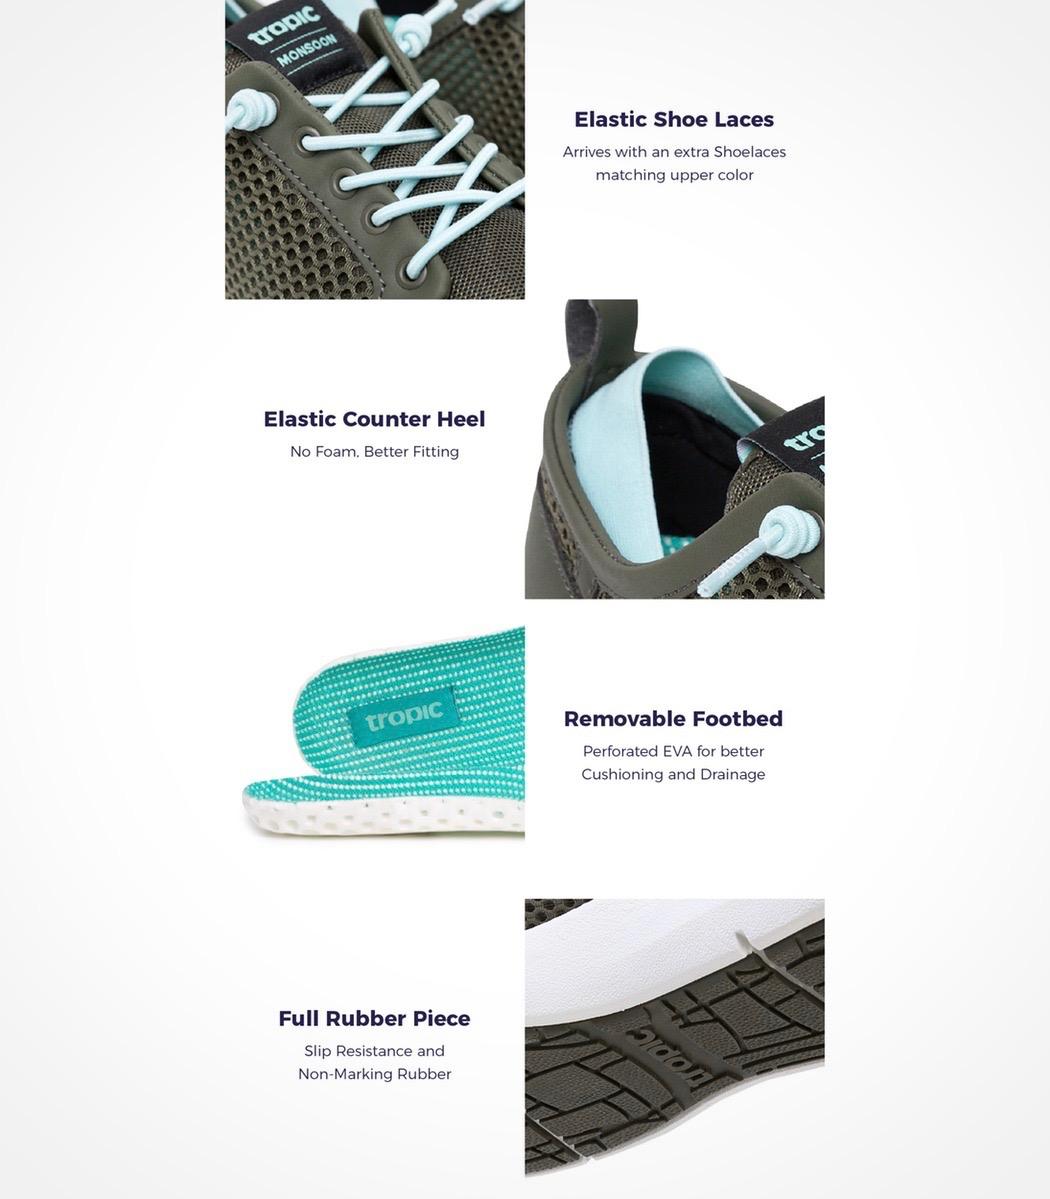 tropic_ultimate_shoe_04